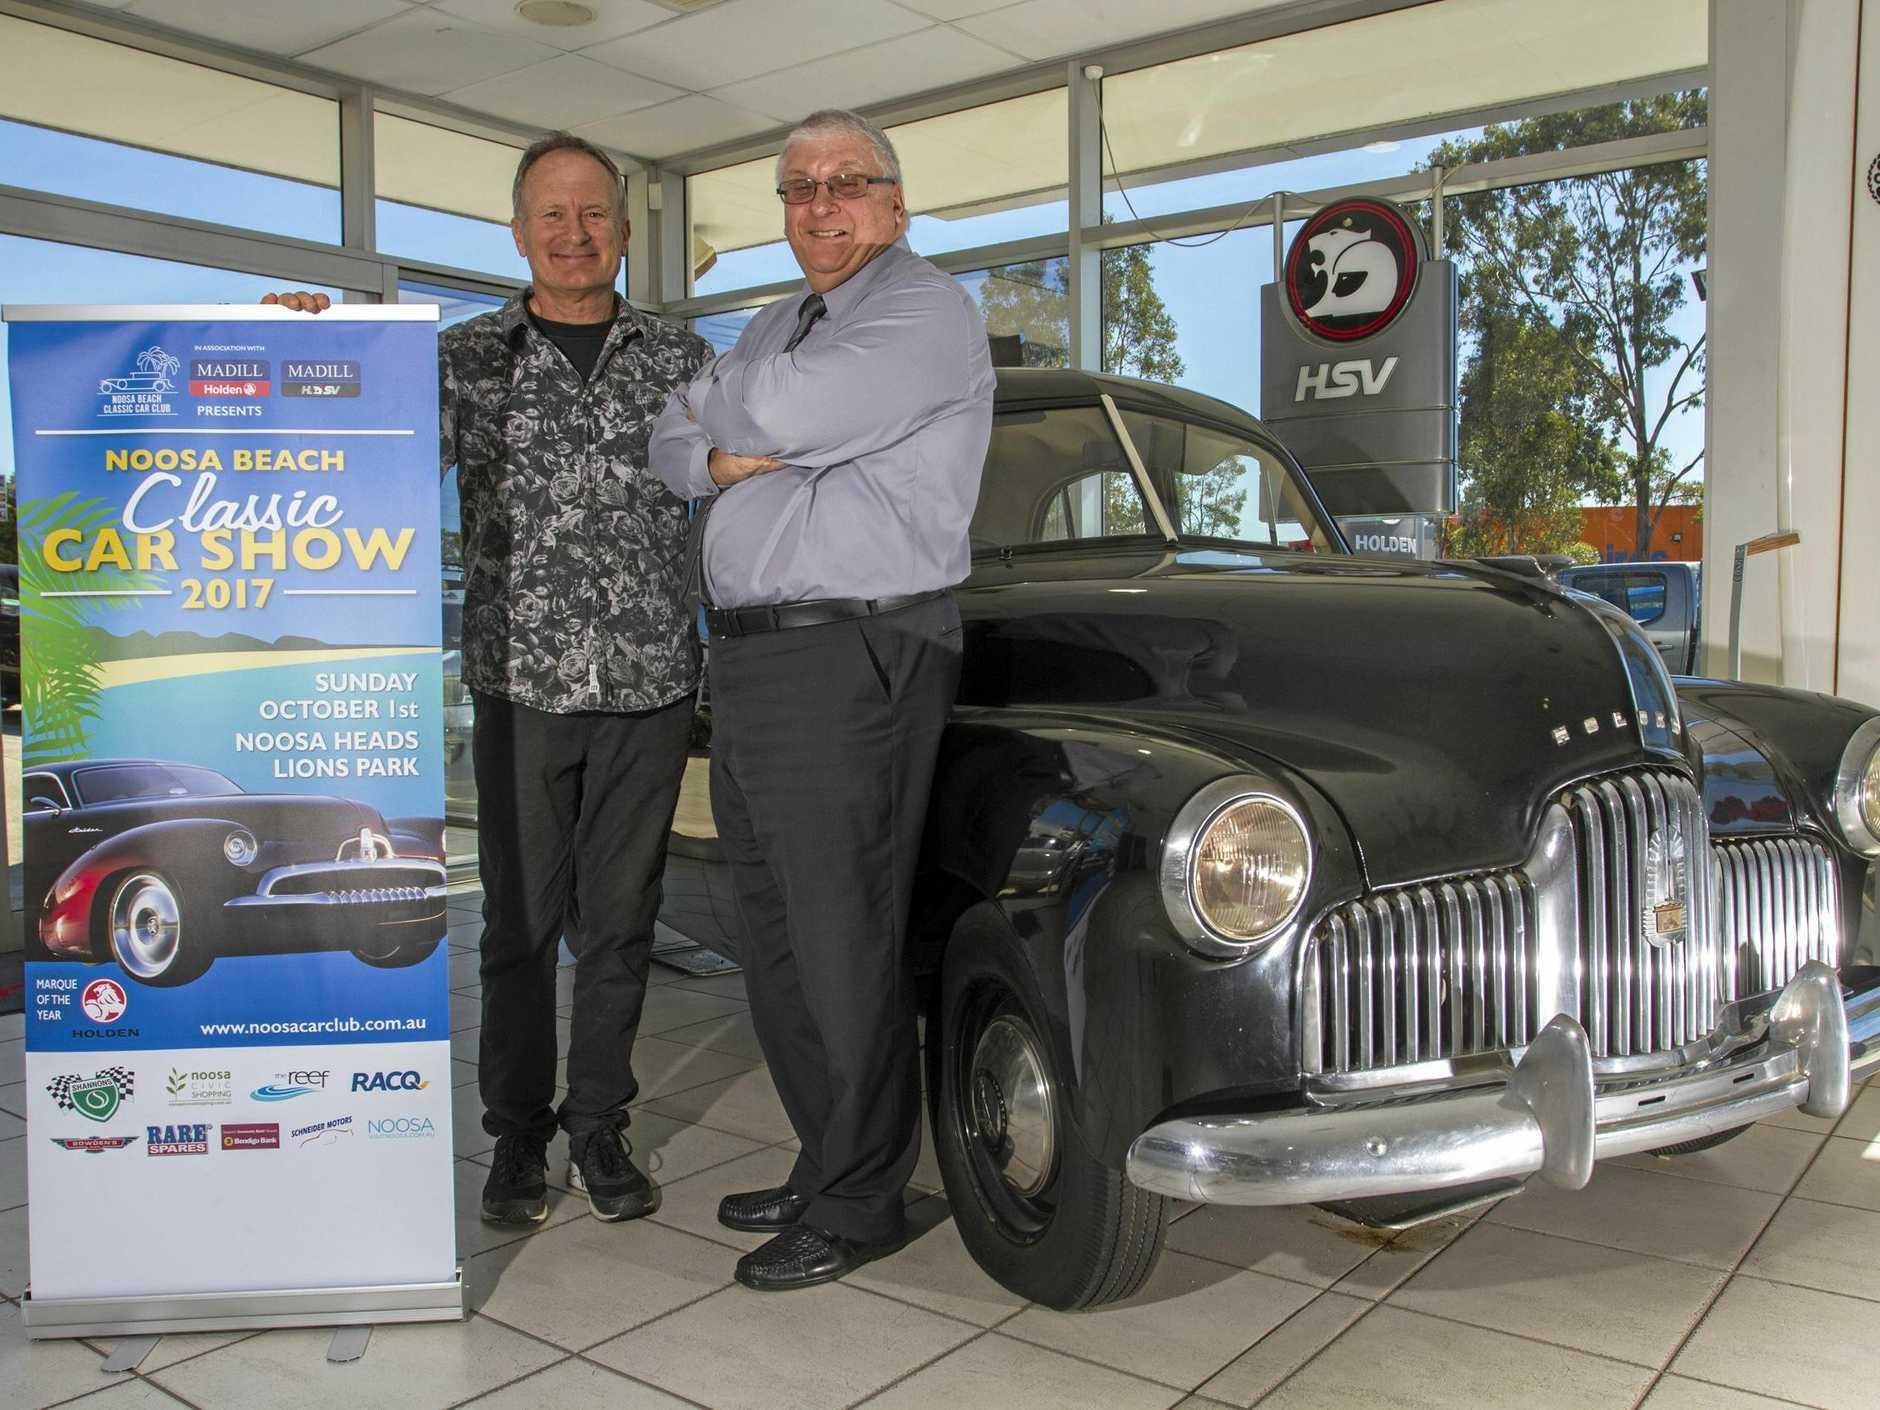 Madill S 1952 Holden Fj To Star At Noosa Classic Car Show Seniors News